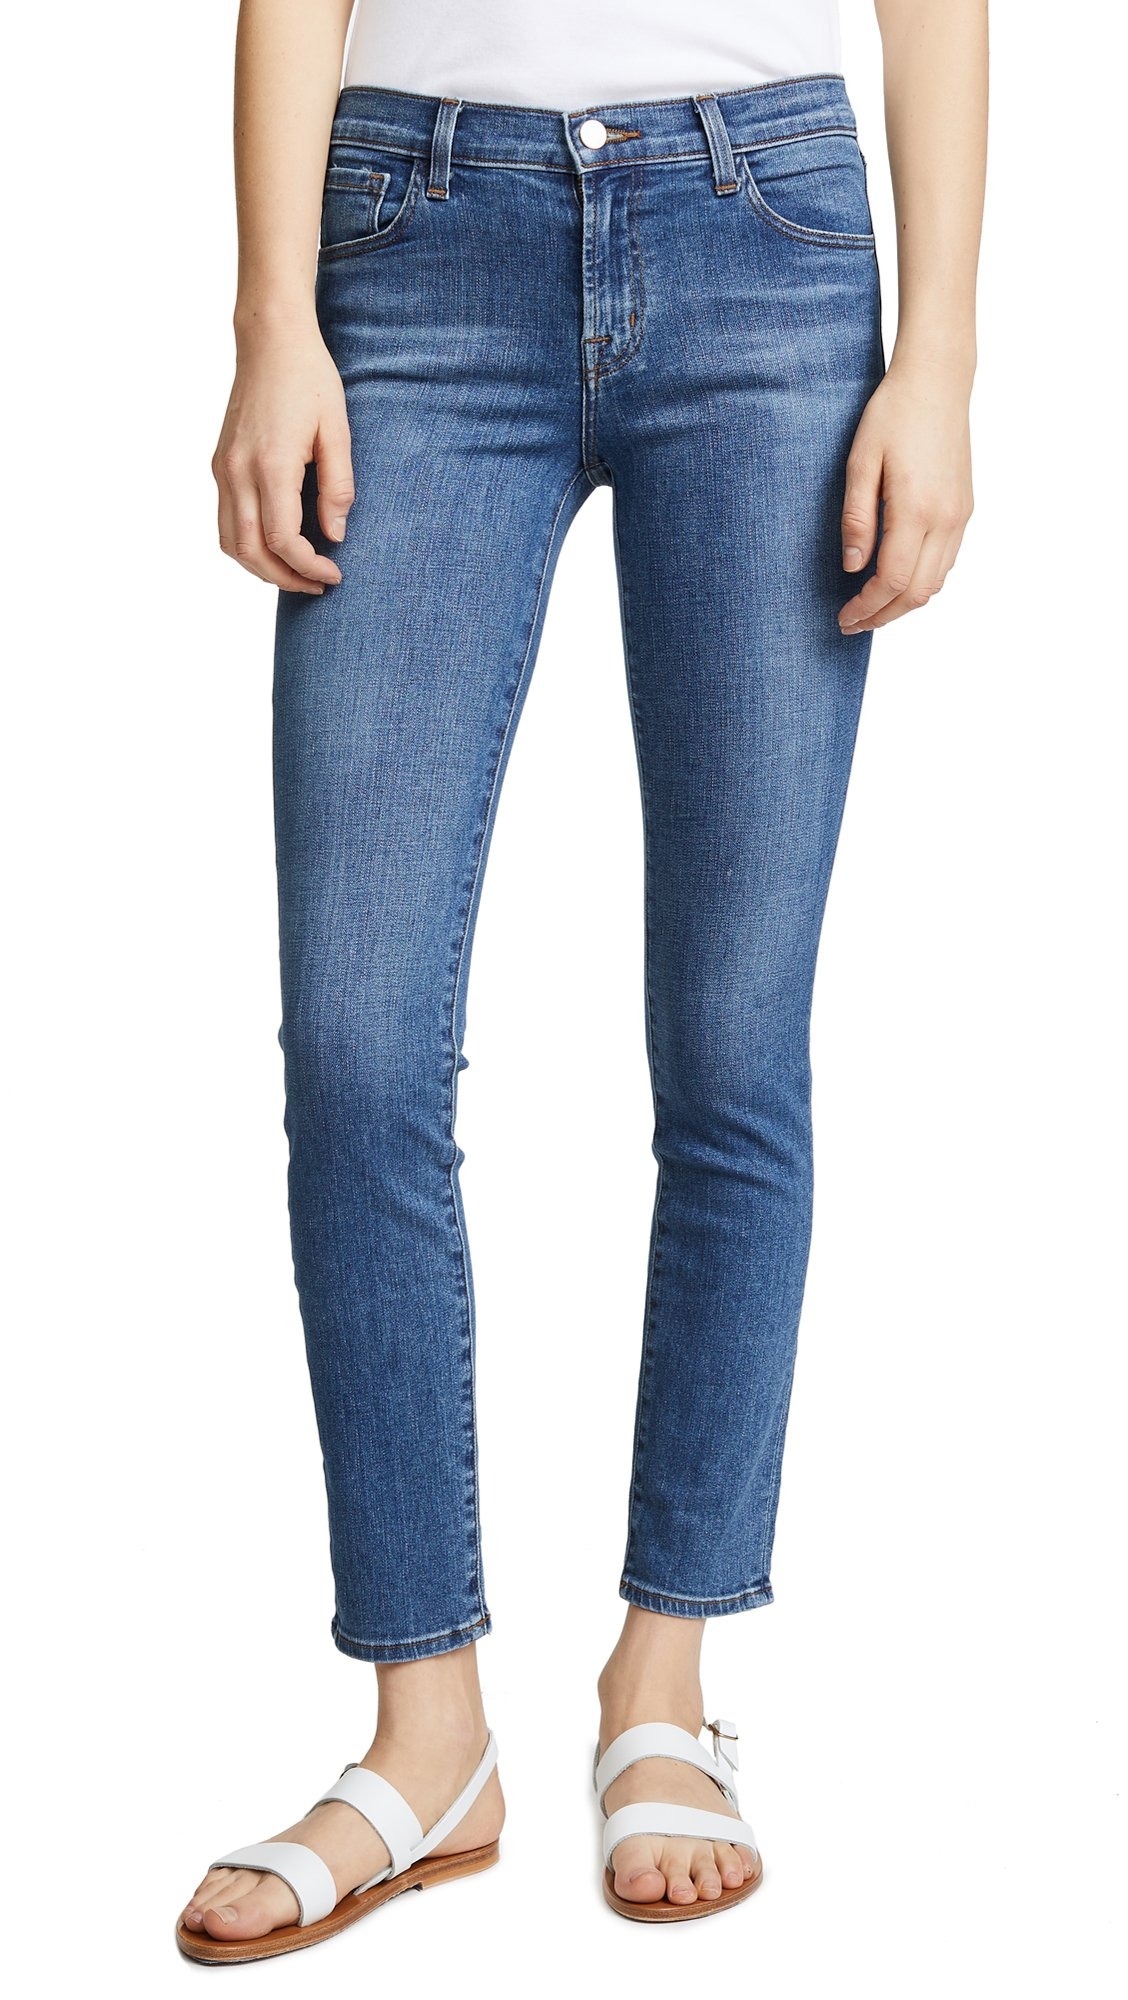 J Brand Women's 811 Mid Rise Skinny Jeans, Lovesick, 25